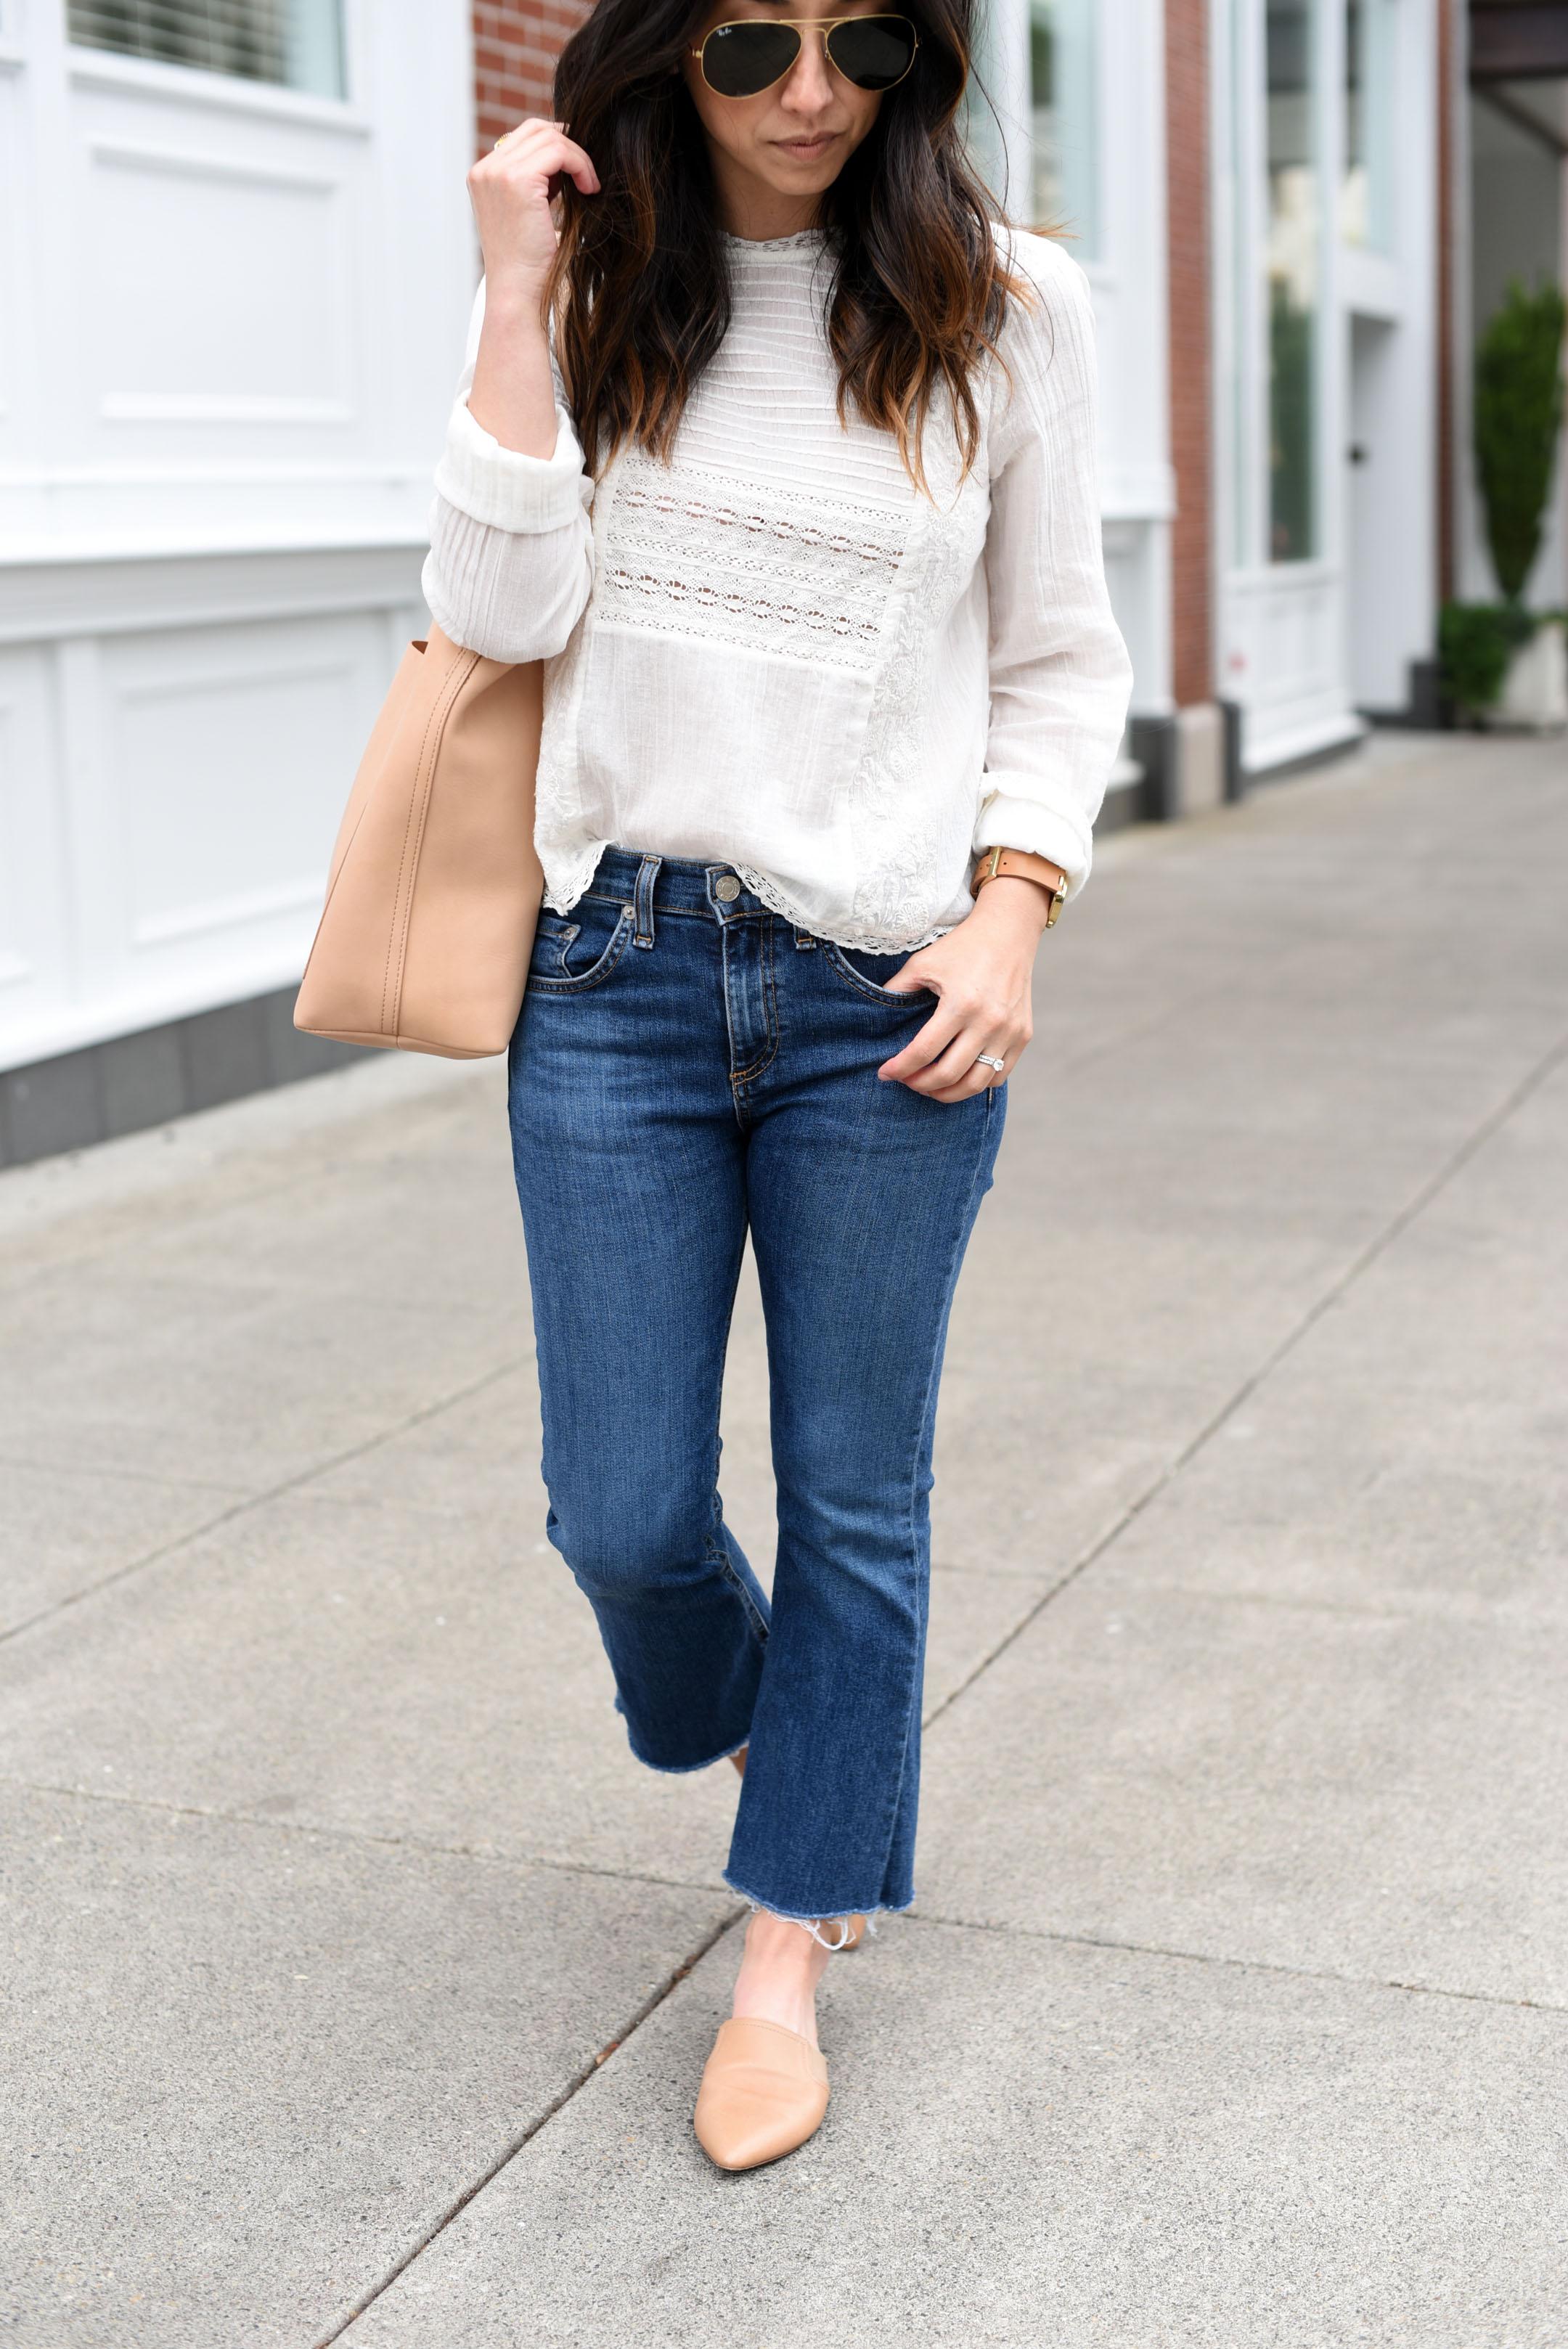 Rag & bone Cropped flar jeans